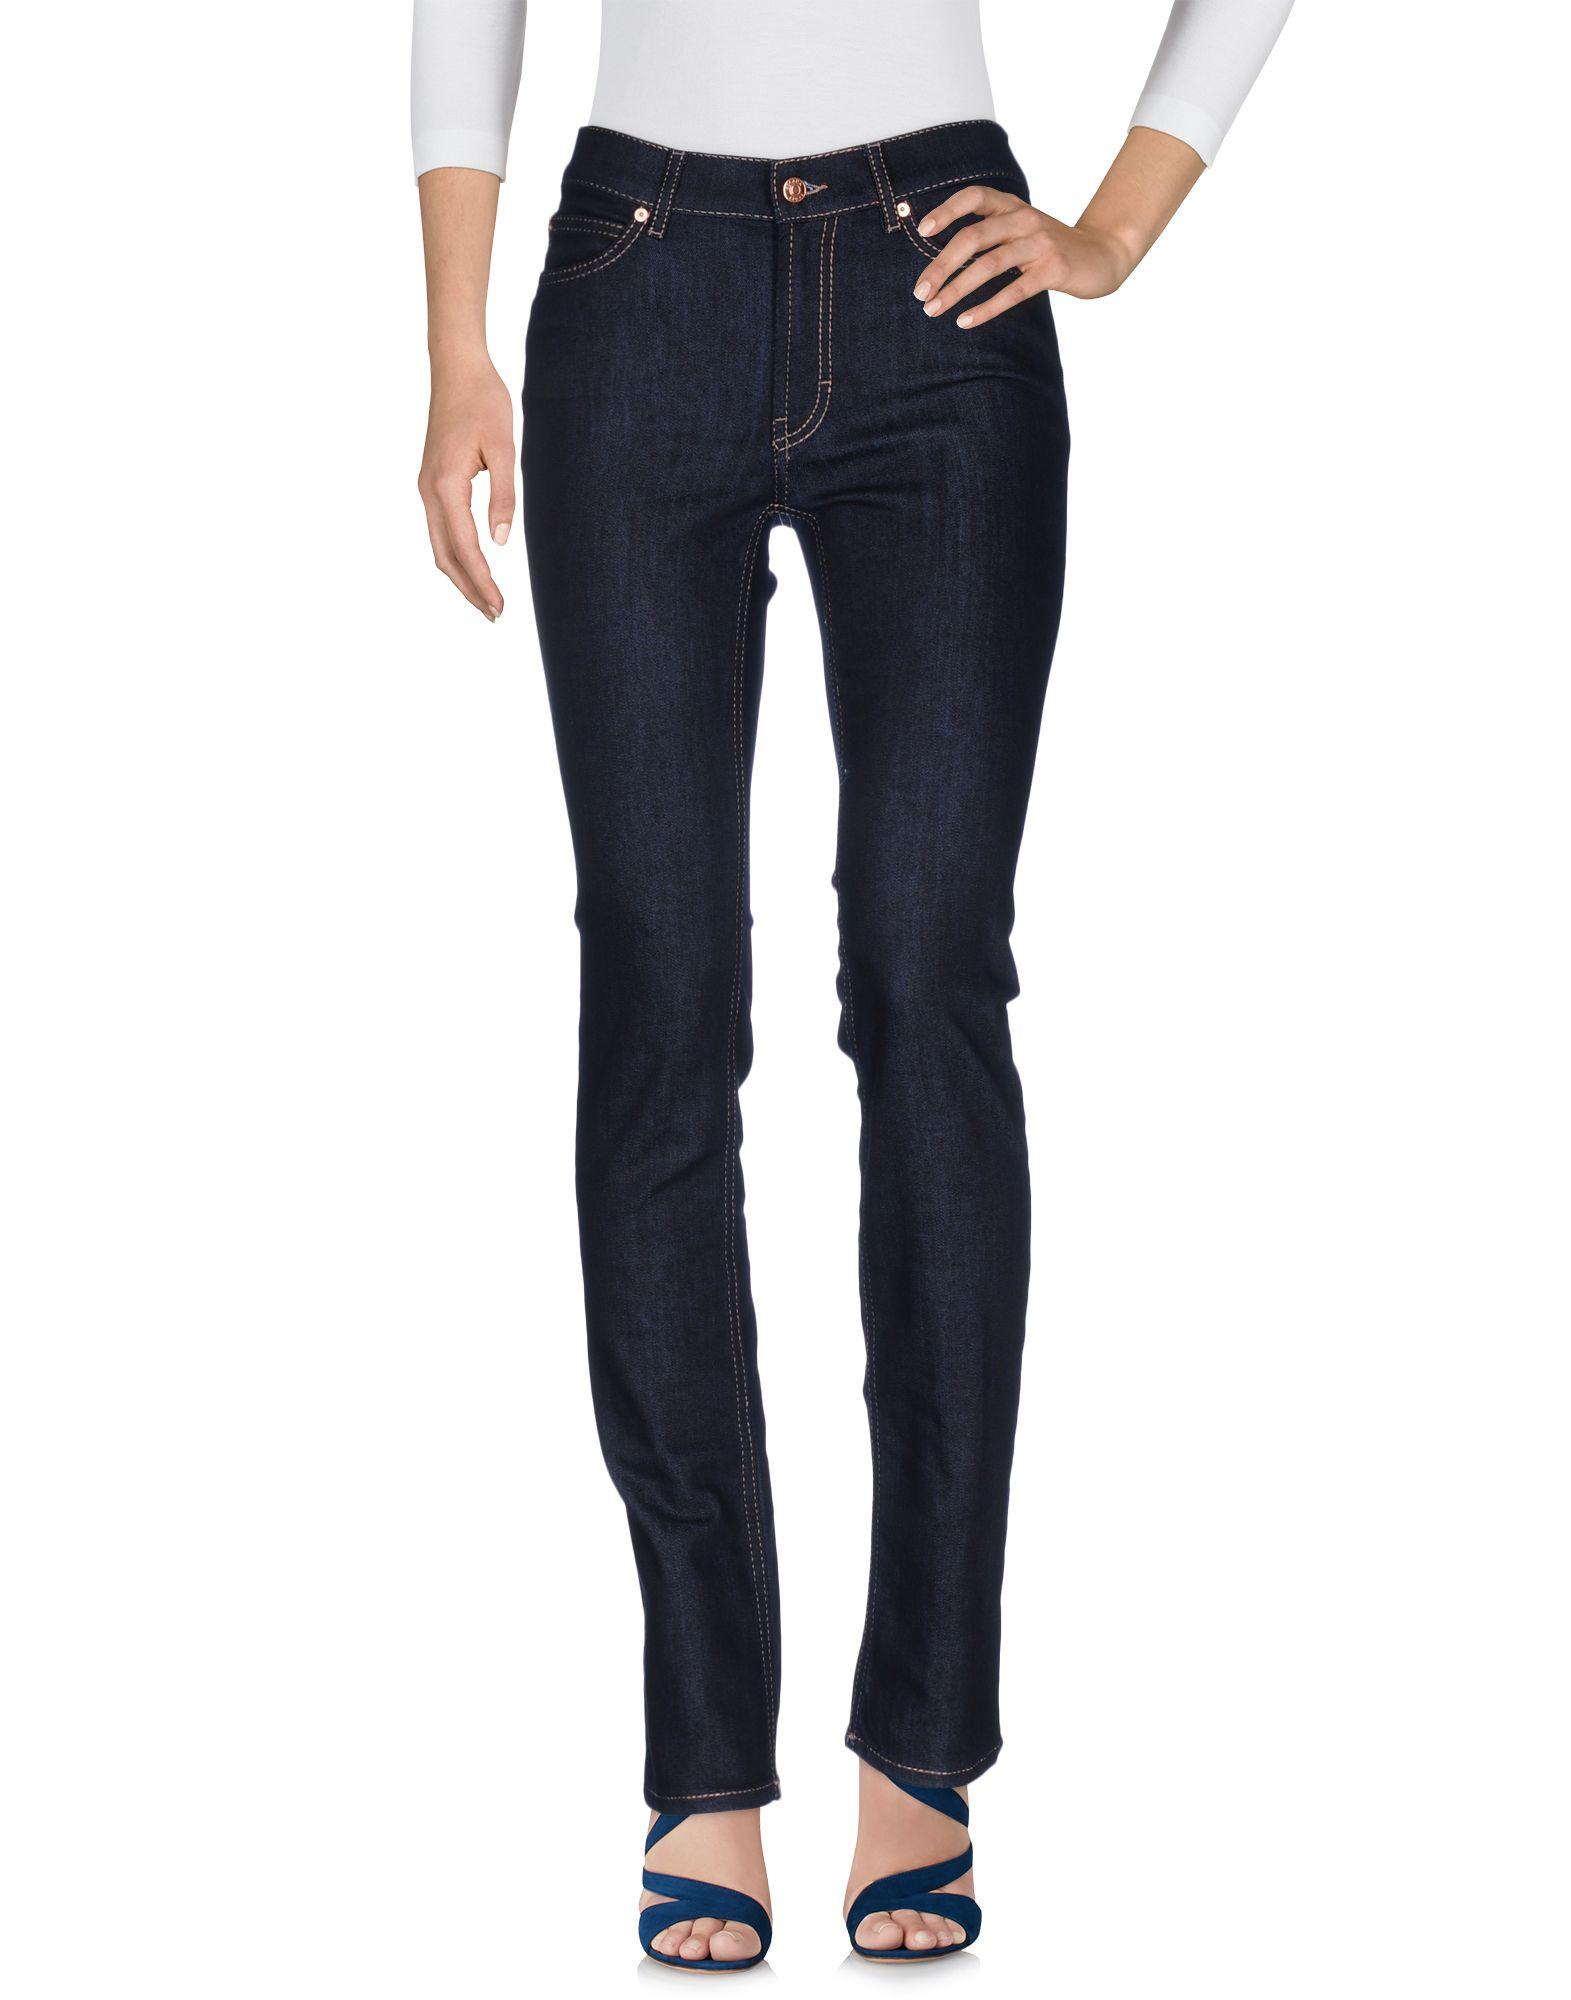 Pantaloni Jeans Escada Sport Donna - Acquista online su gArS4t3AX